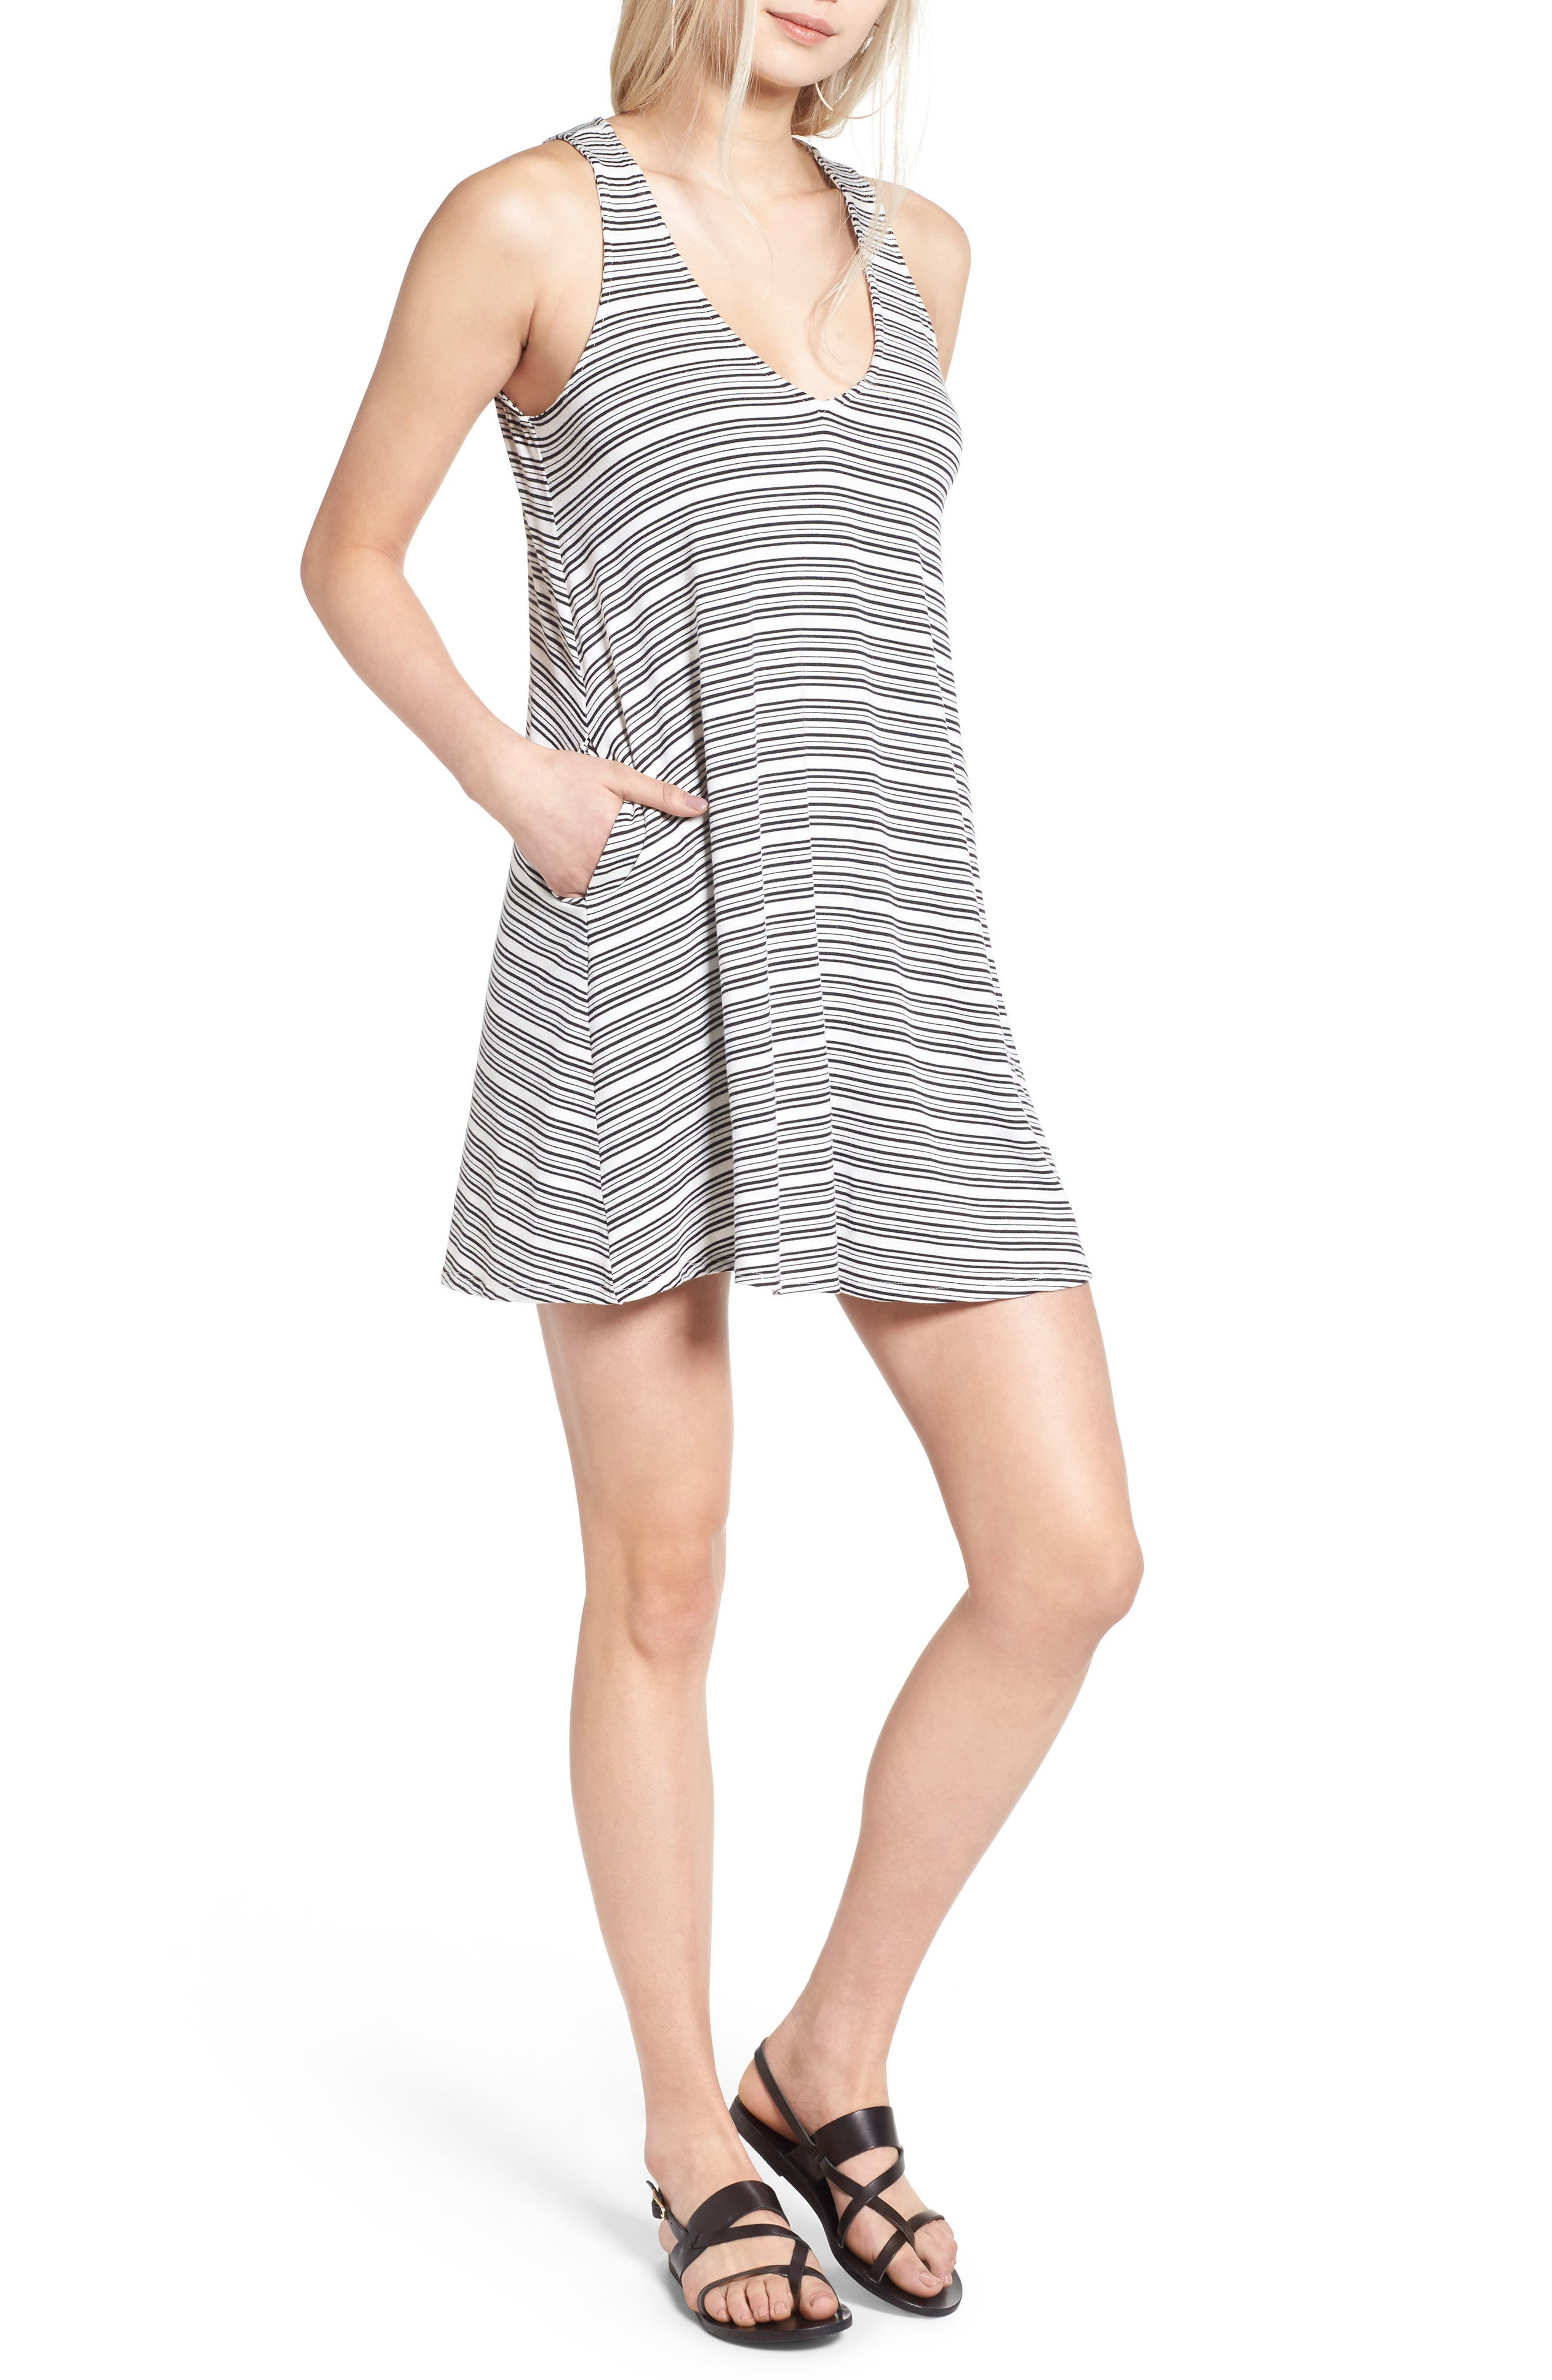 Alternate Image 1 Selected - Socialite Pocket Tank Dress